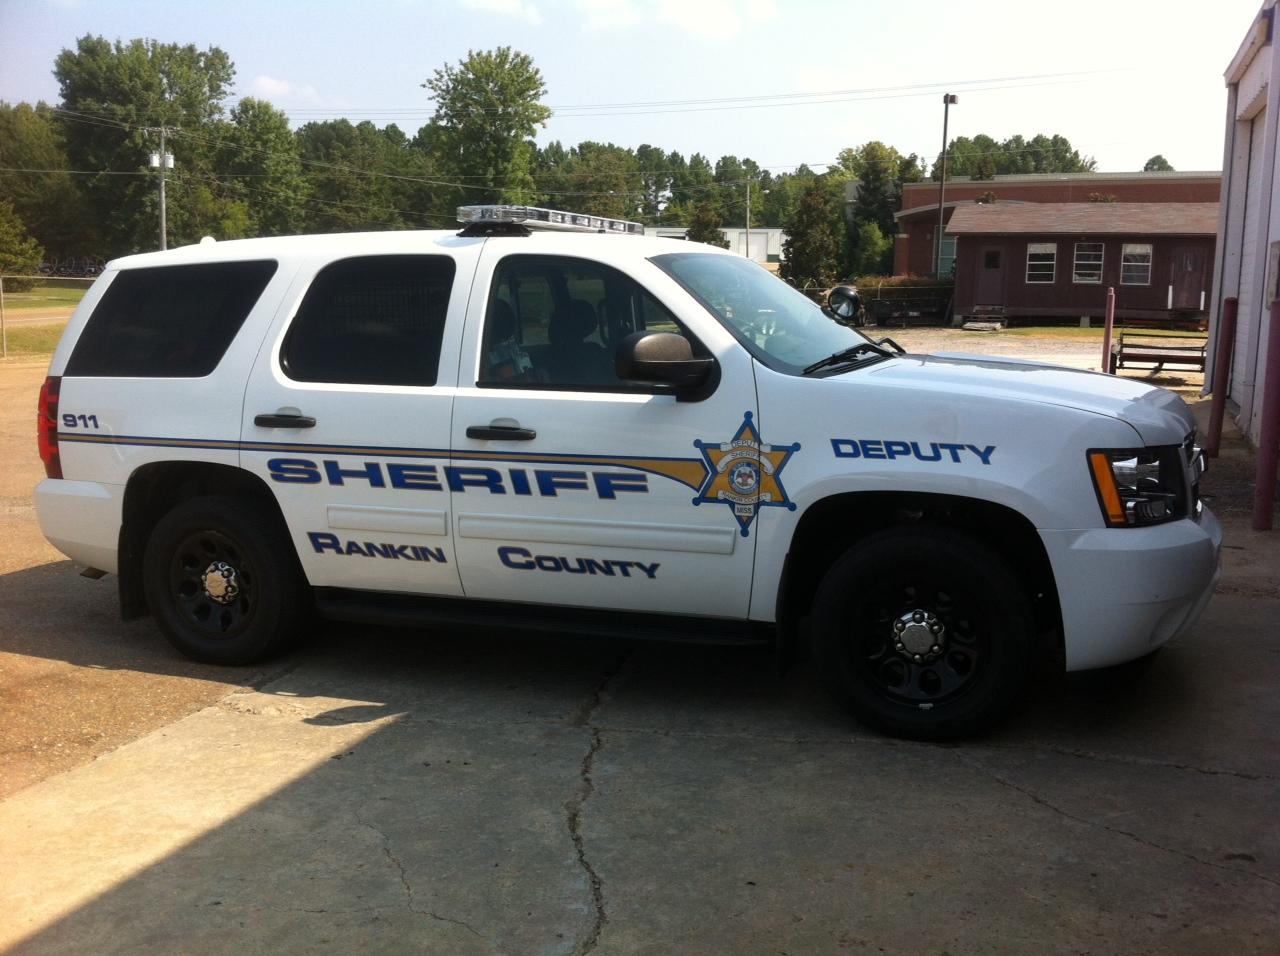 Mississippi rankin county sandhill - Rankin So